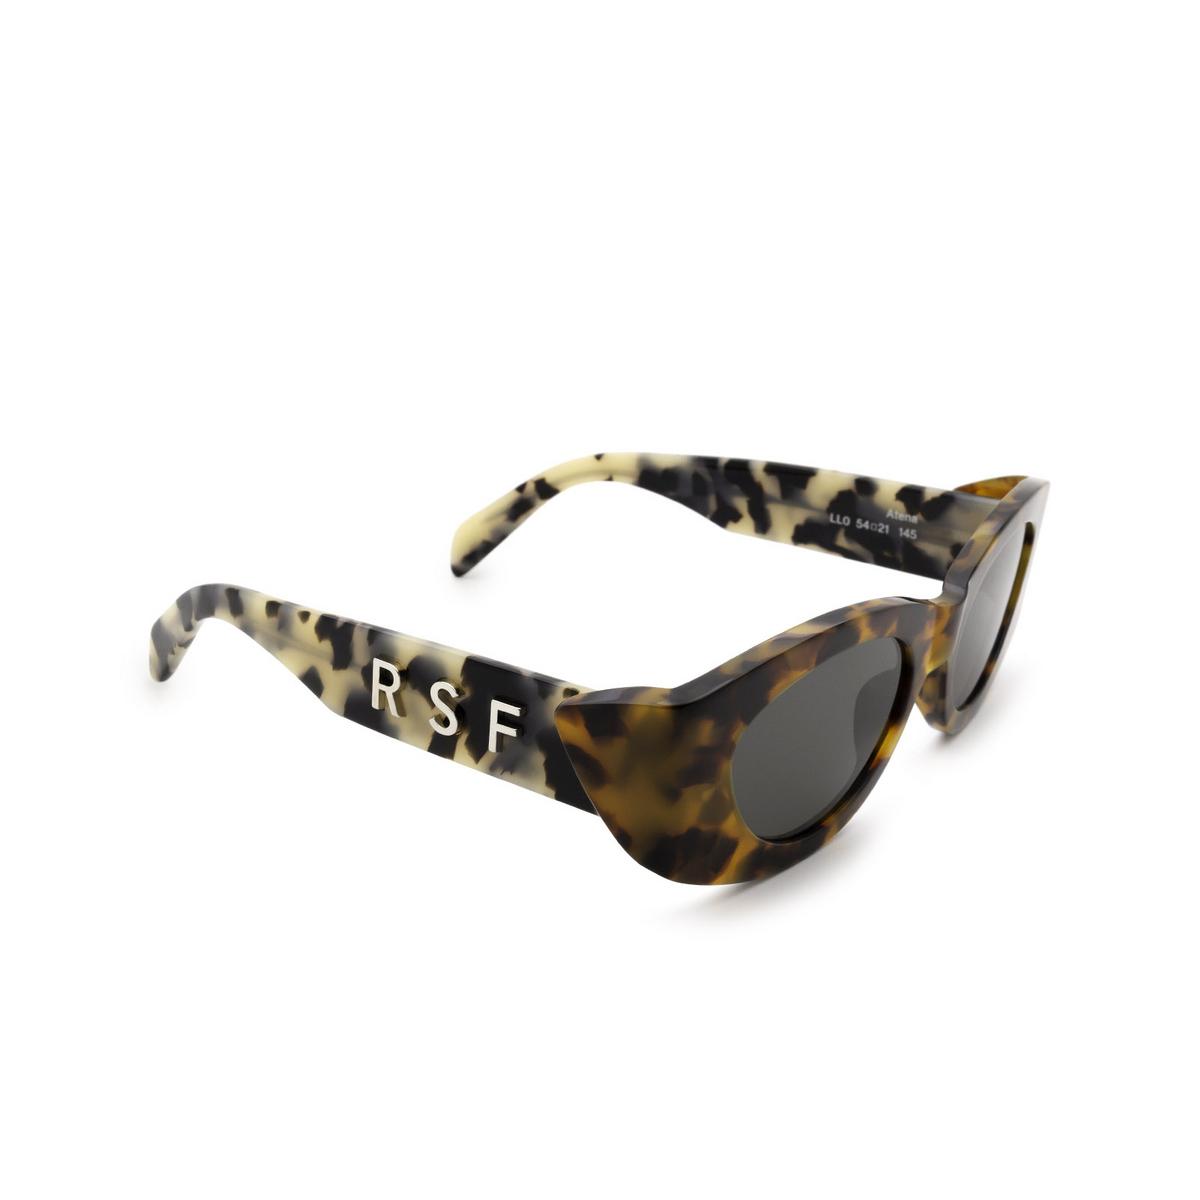 Retrosuperfuture® Oval Sunglasses: Atena color Orgia Havana LL0 - three-quarters view.